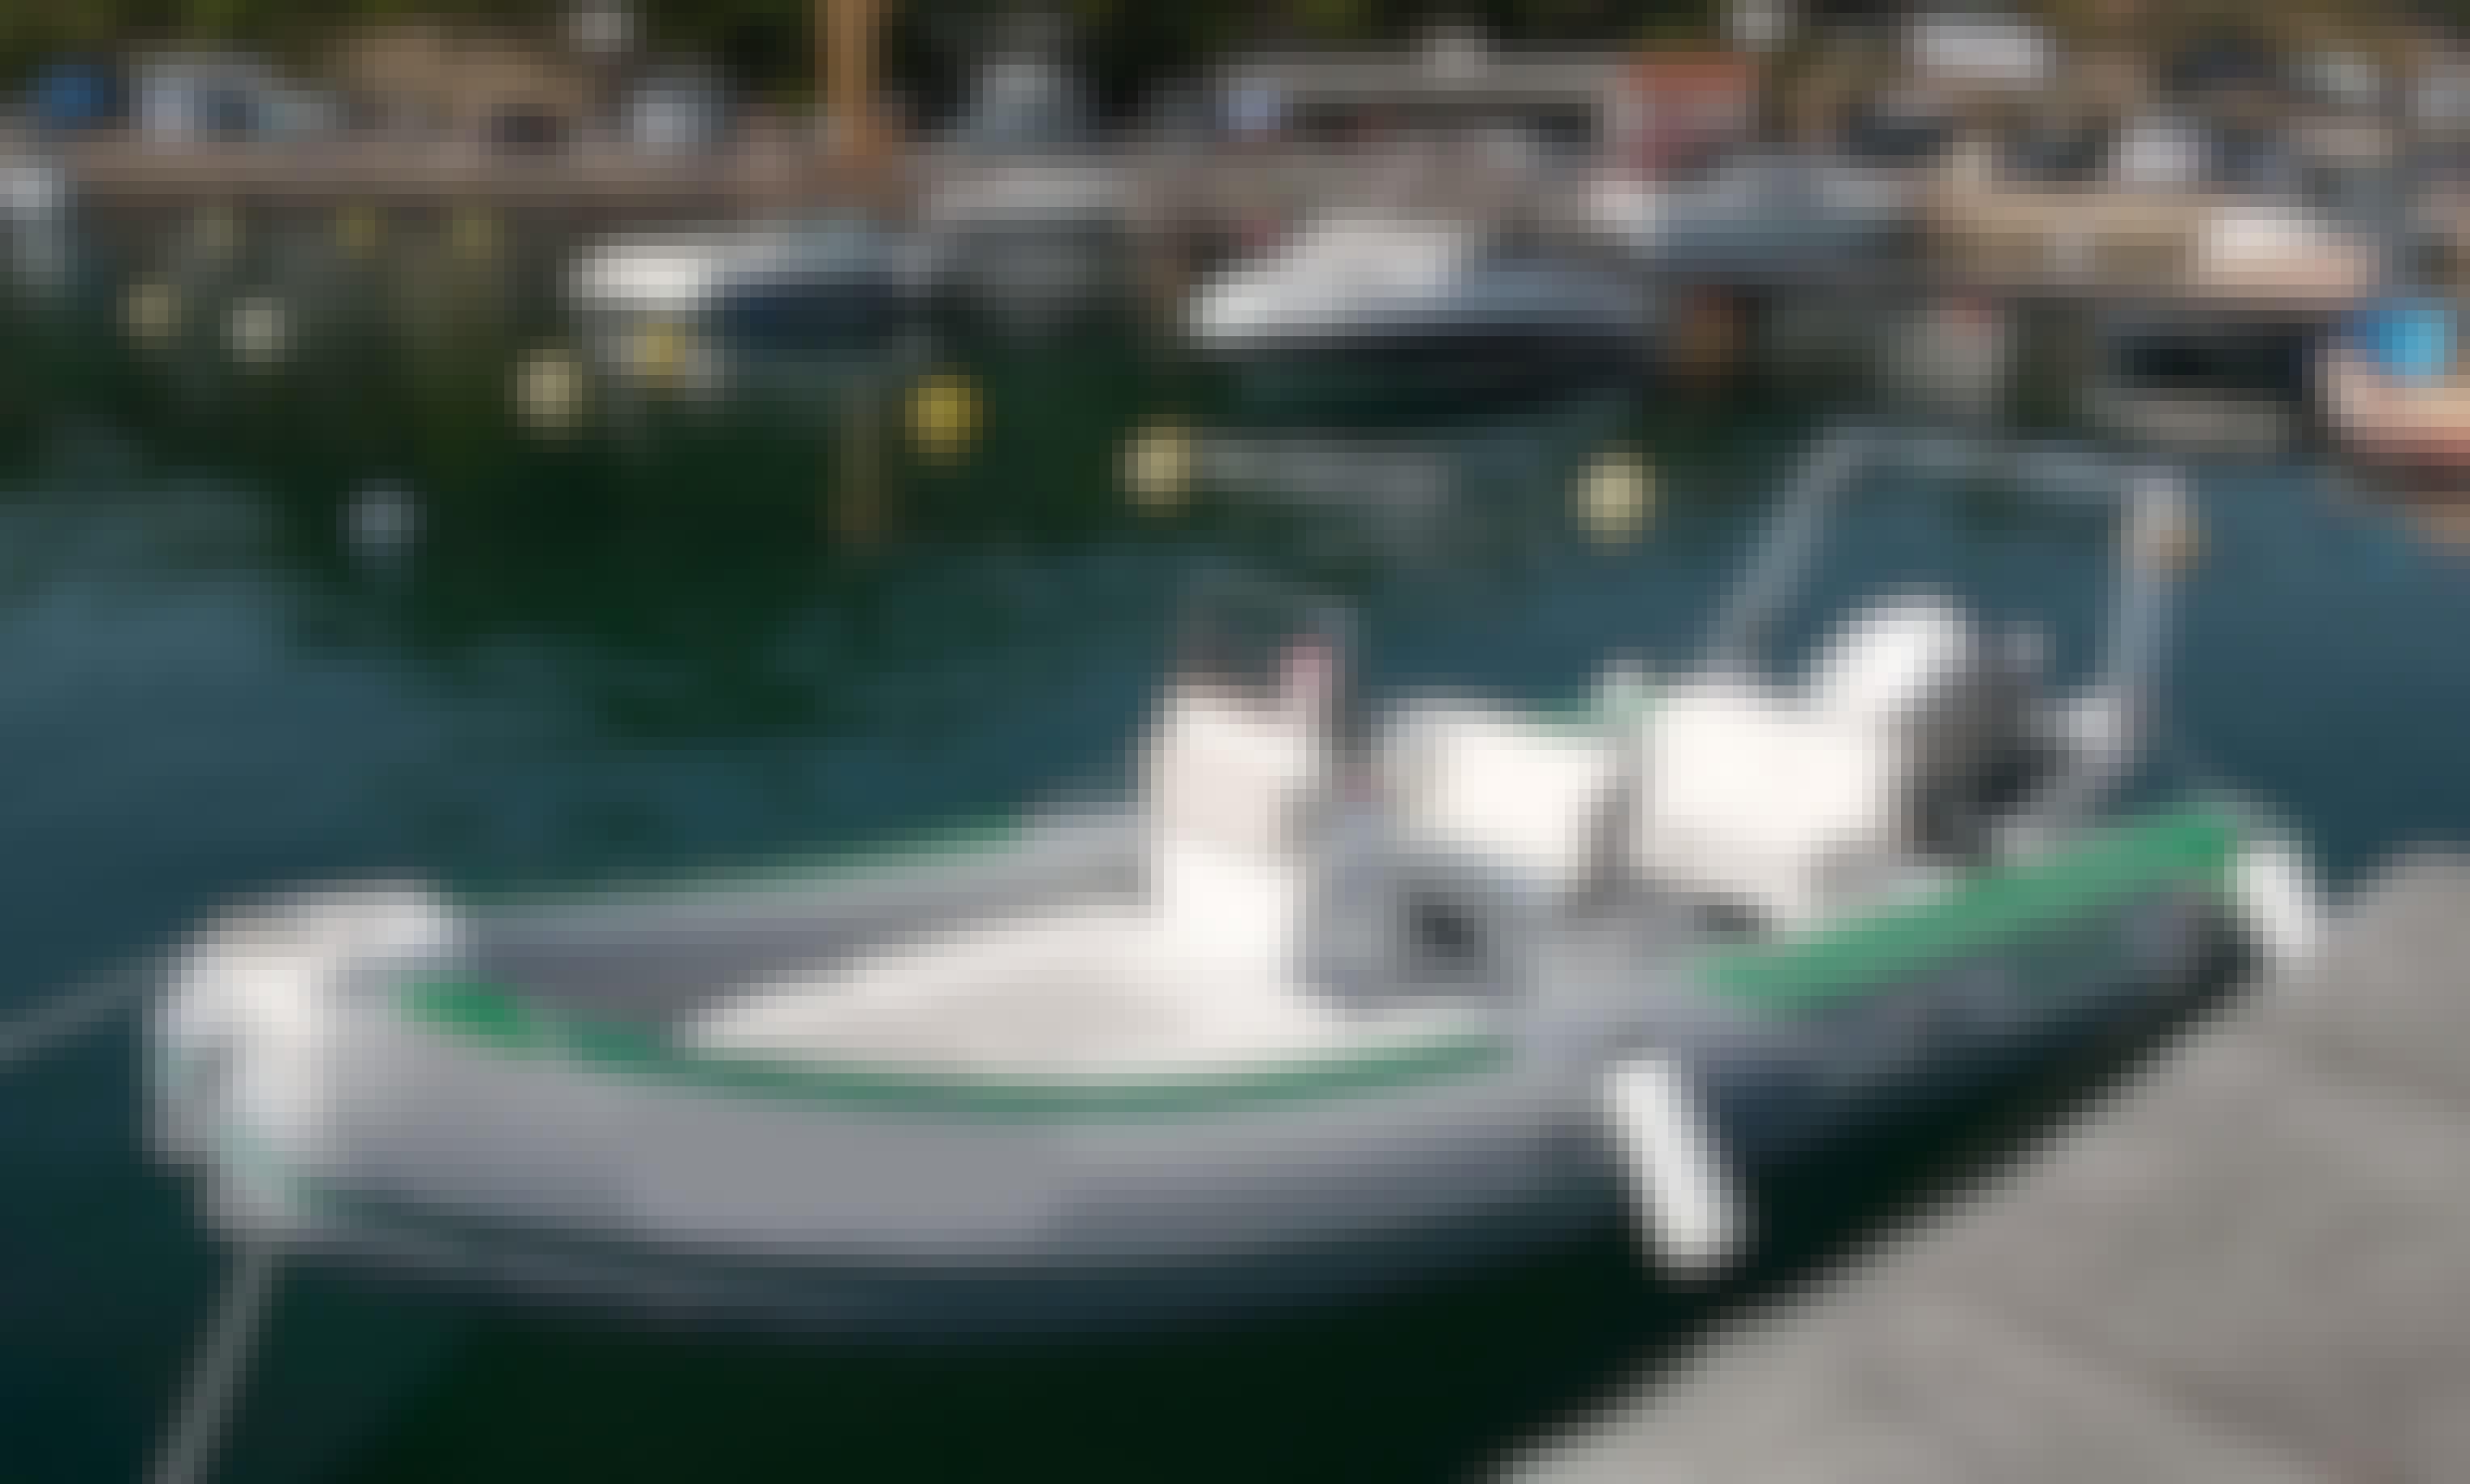 Ready to Rent Lomac 550 Rigid Inflatable Boat for 10 Person in Orebić, Croatia